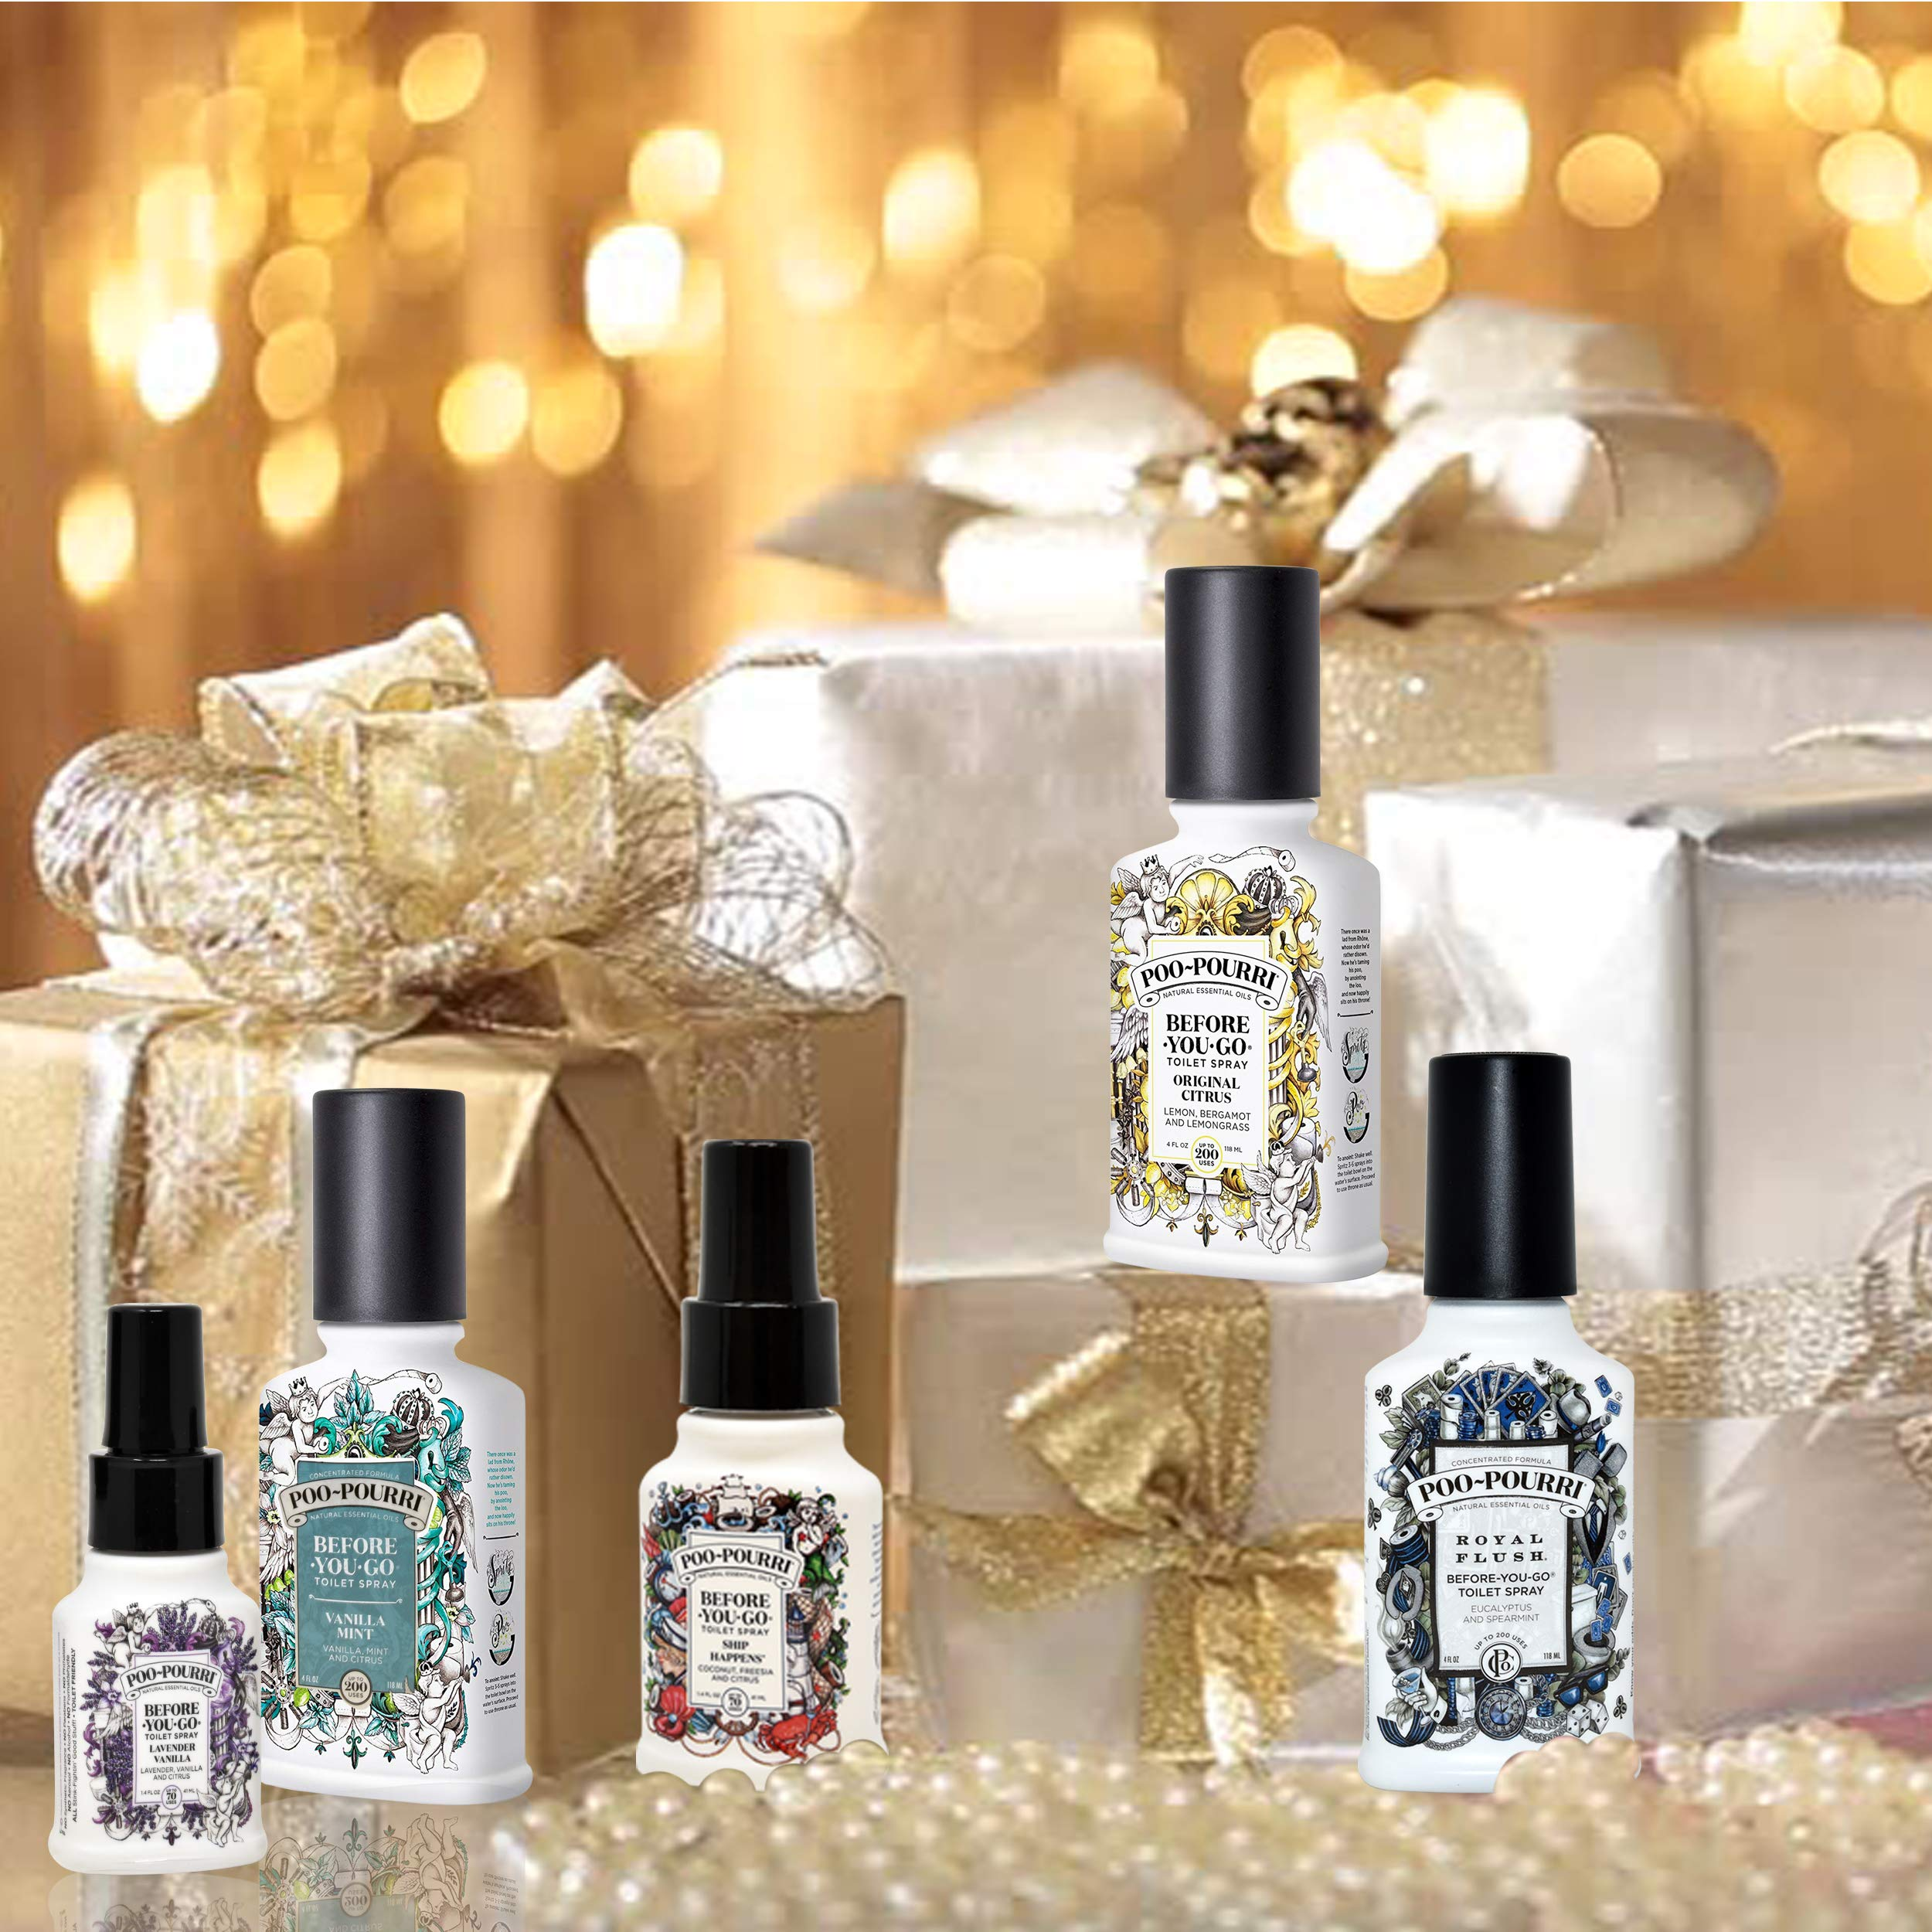 Poo-Pourri Set - Includes Original Citrus 4 Ounce, Royal Flush 4 Ounce, Vanilla Mint 4 Ounce, Ship Happens 1.4 Ounce, and Lavender Vanilla 1.4 Ounce by Poo-Pourri (Image #4)